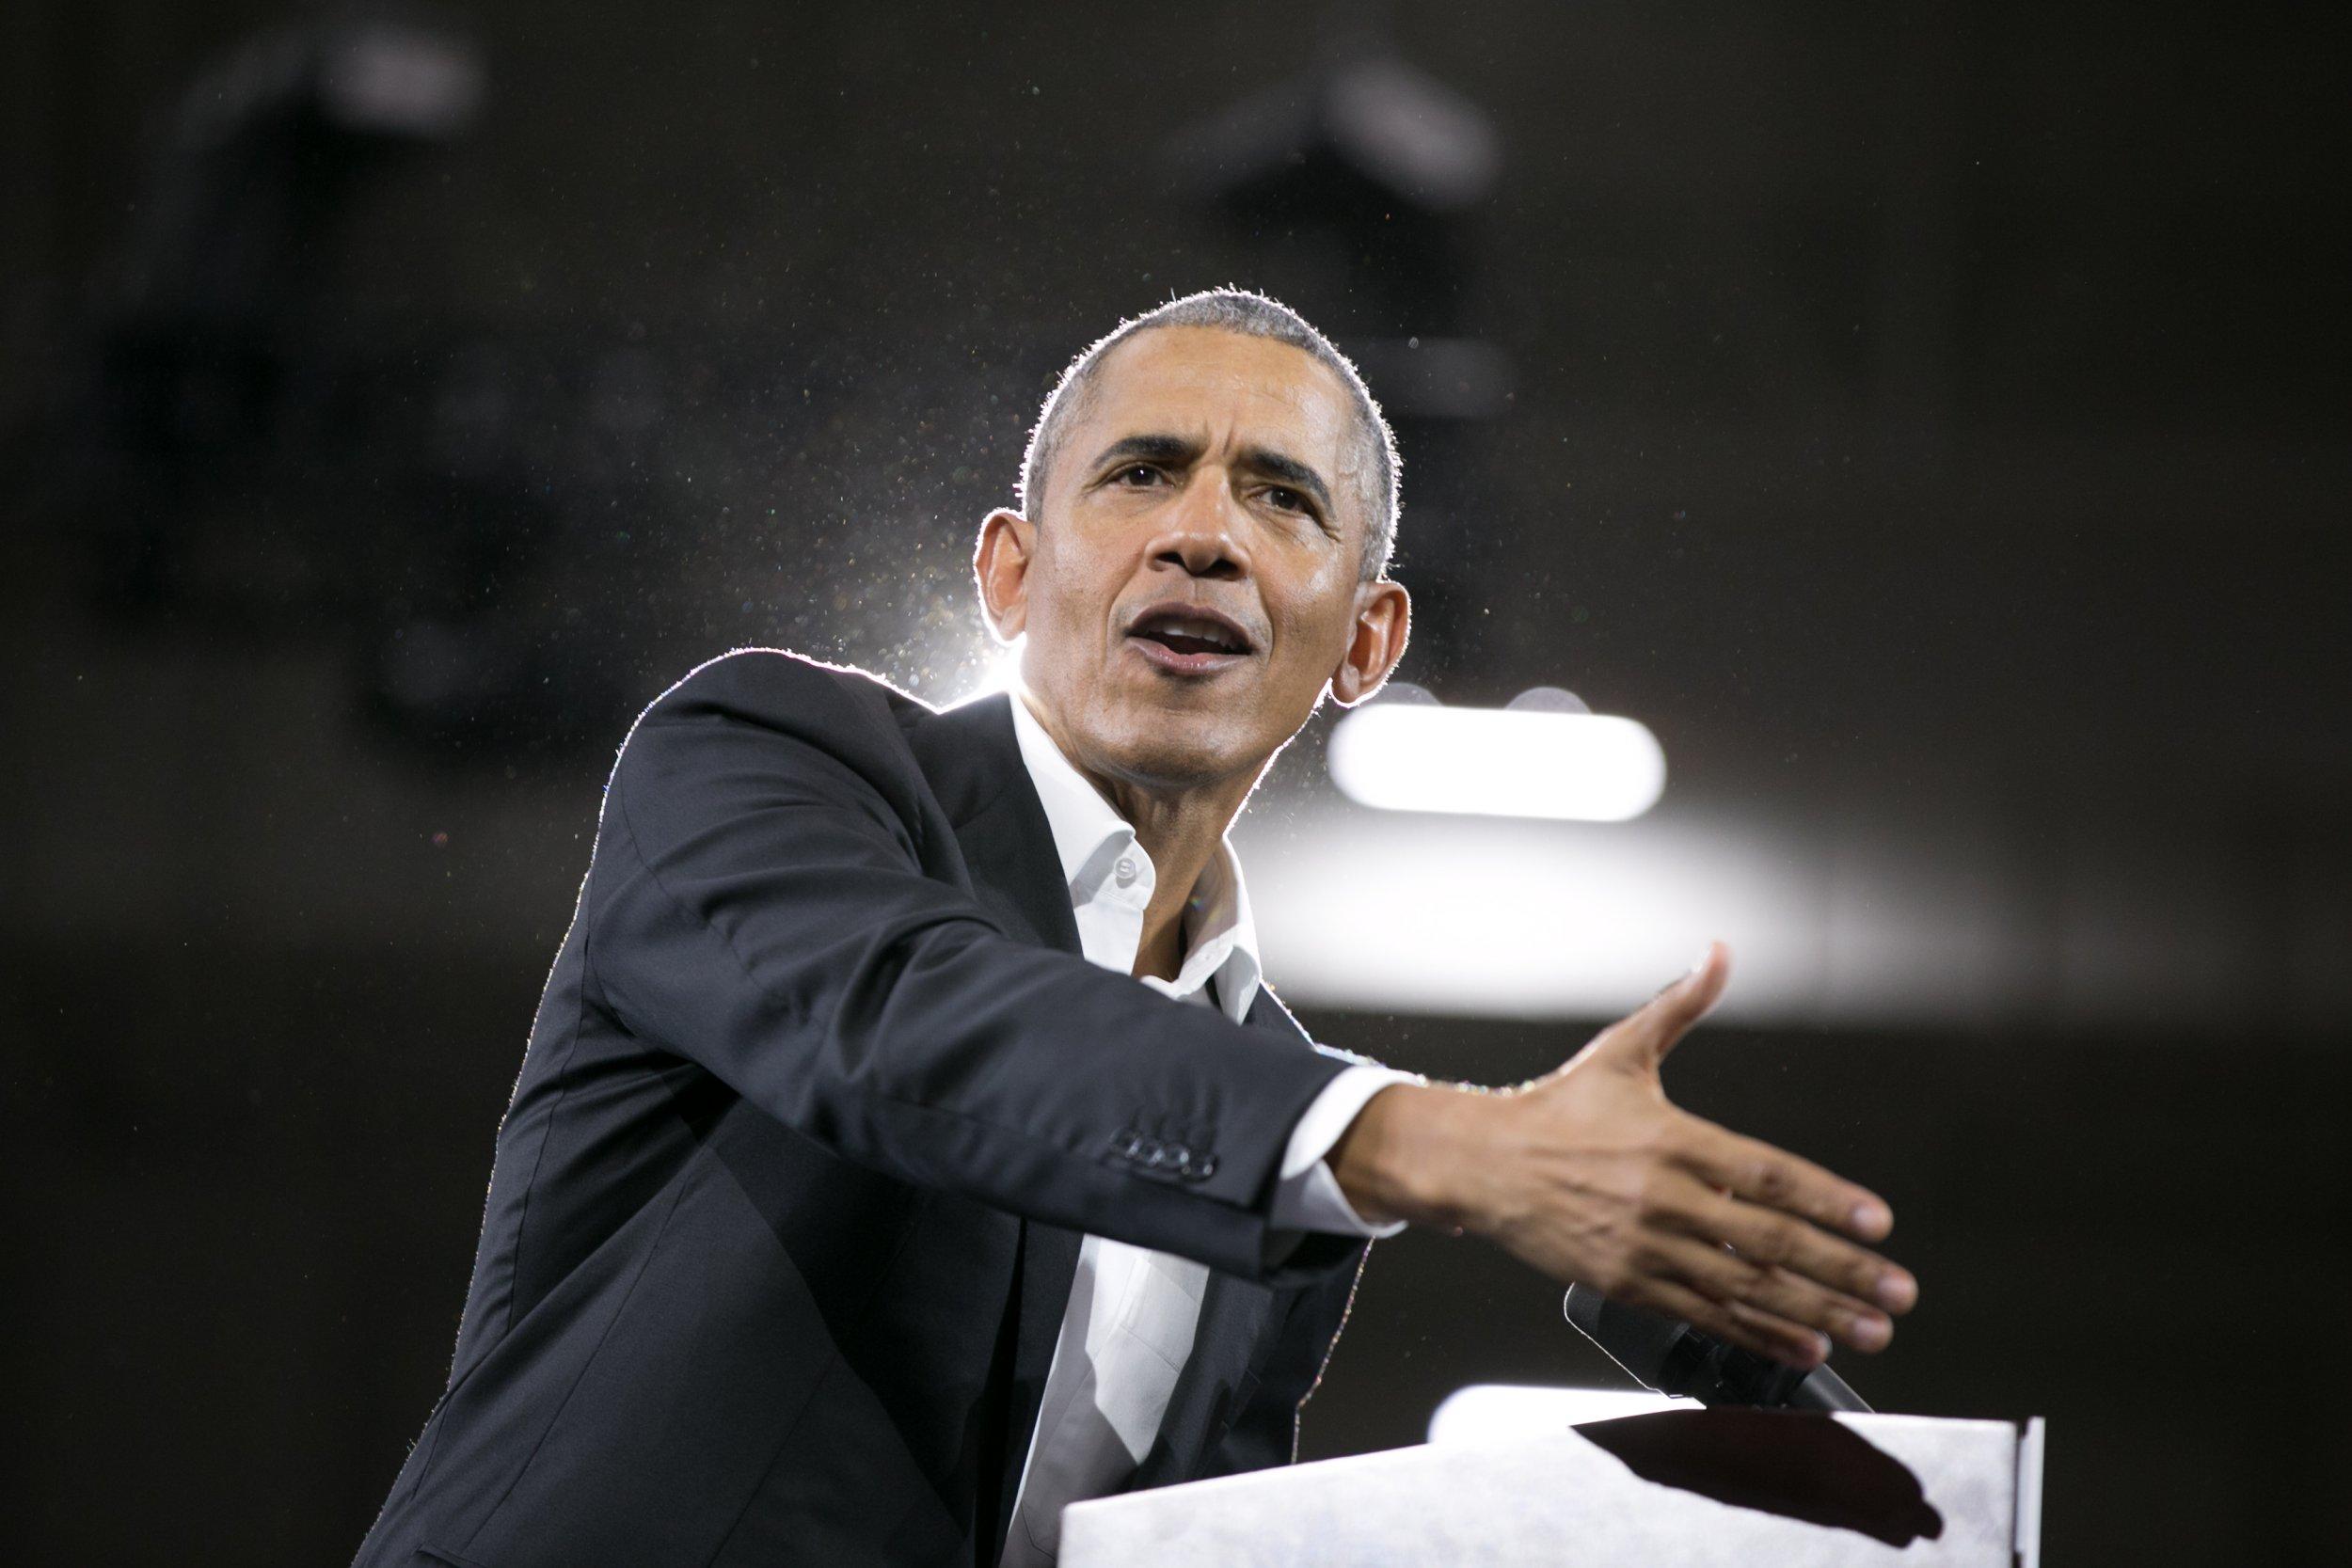 barack obama, donald turmp